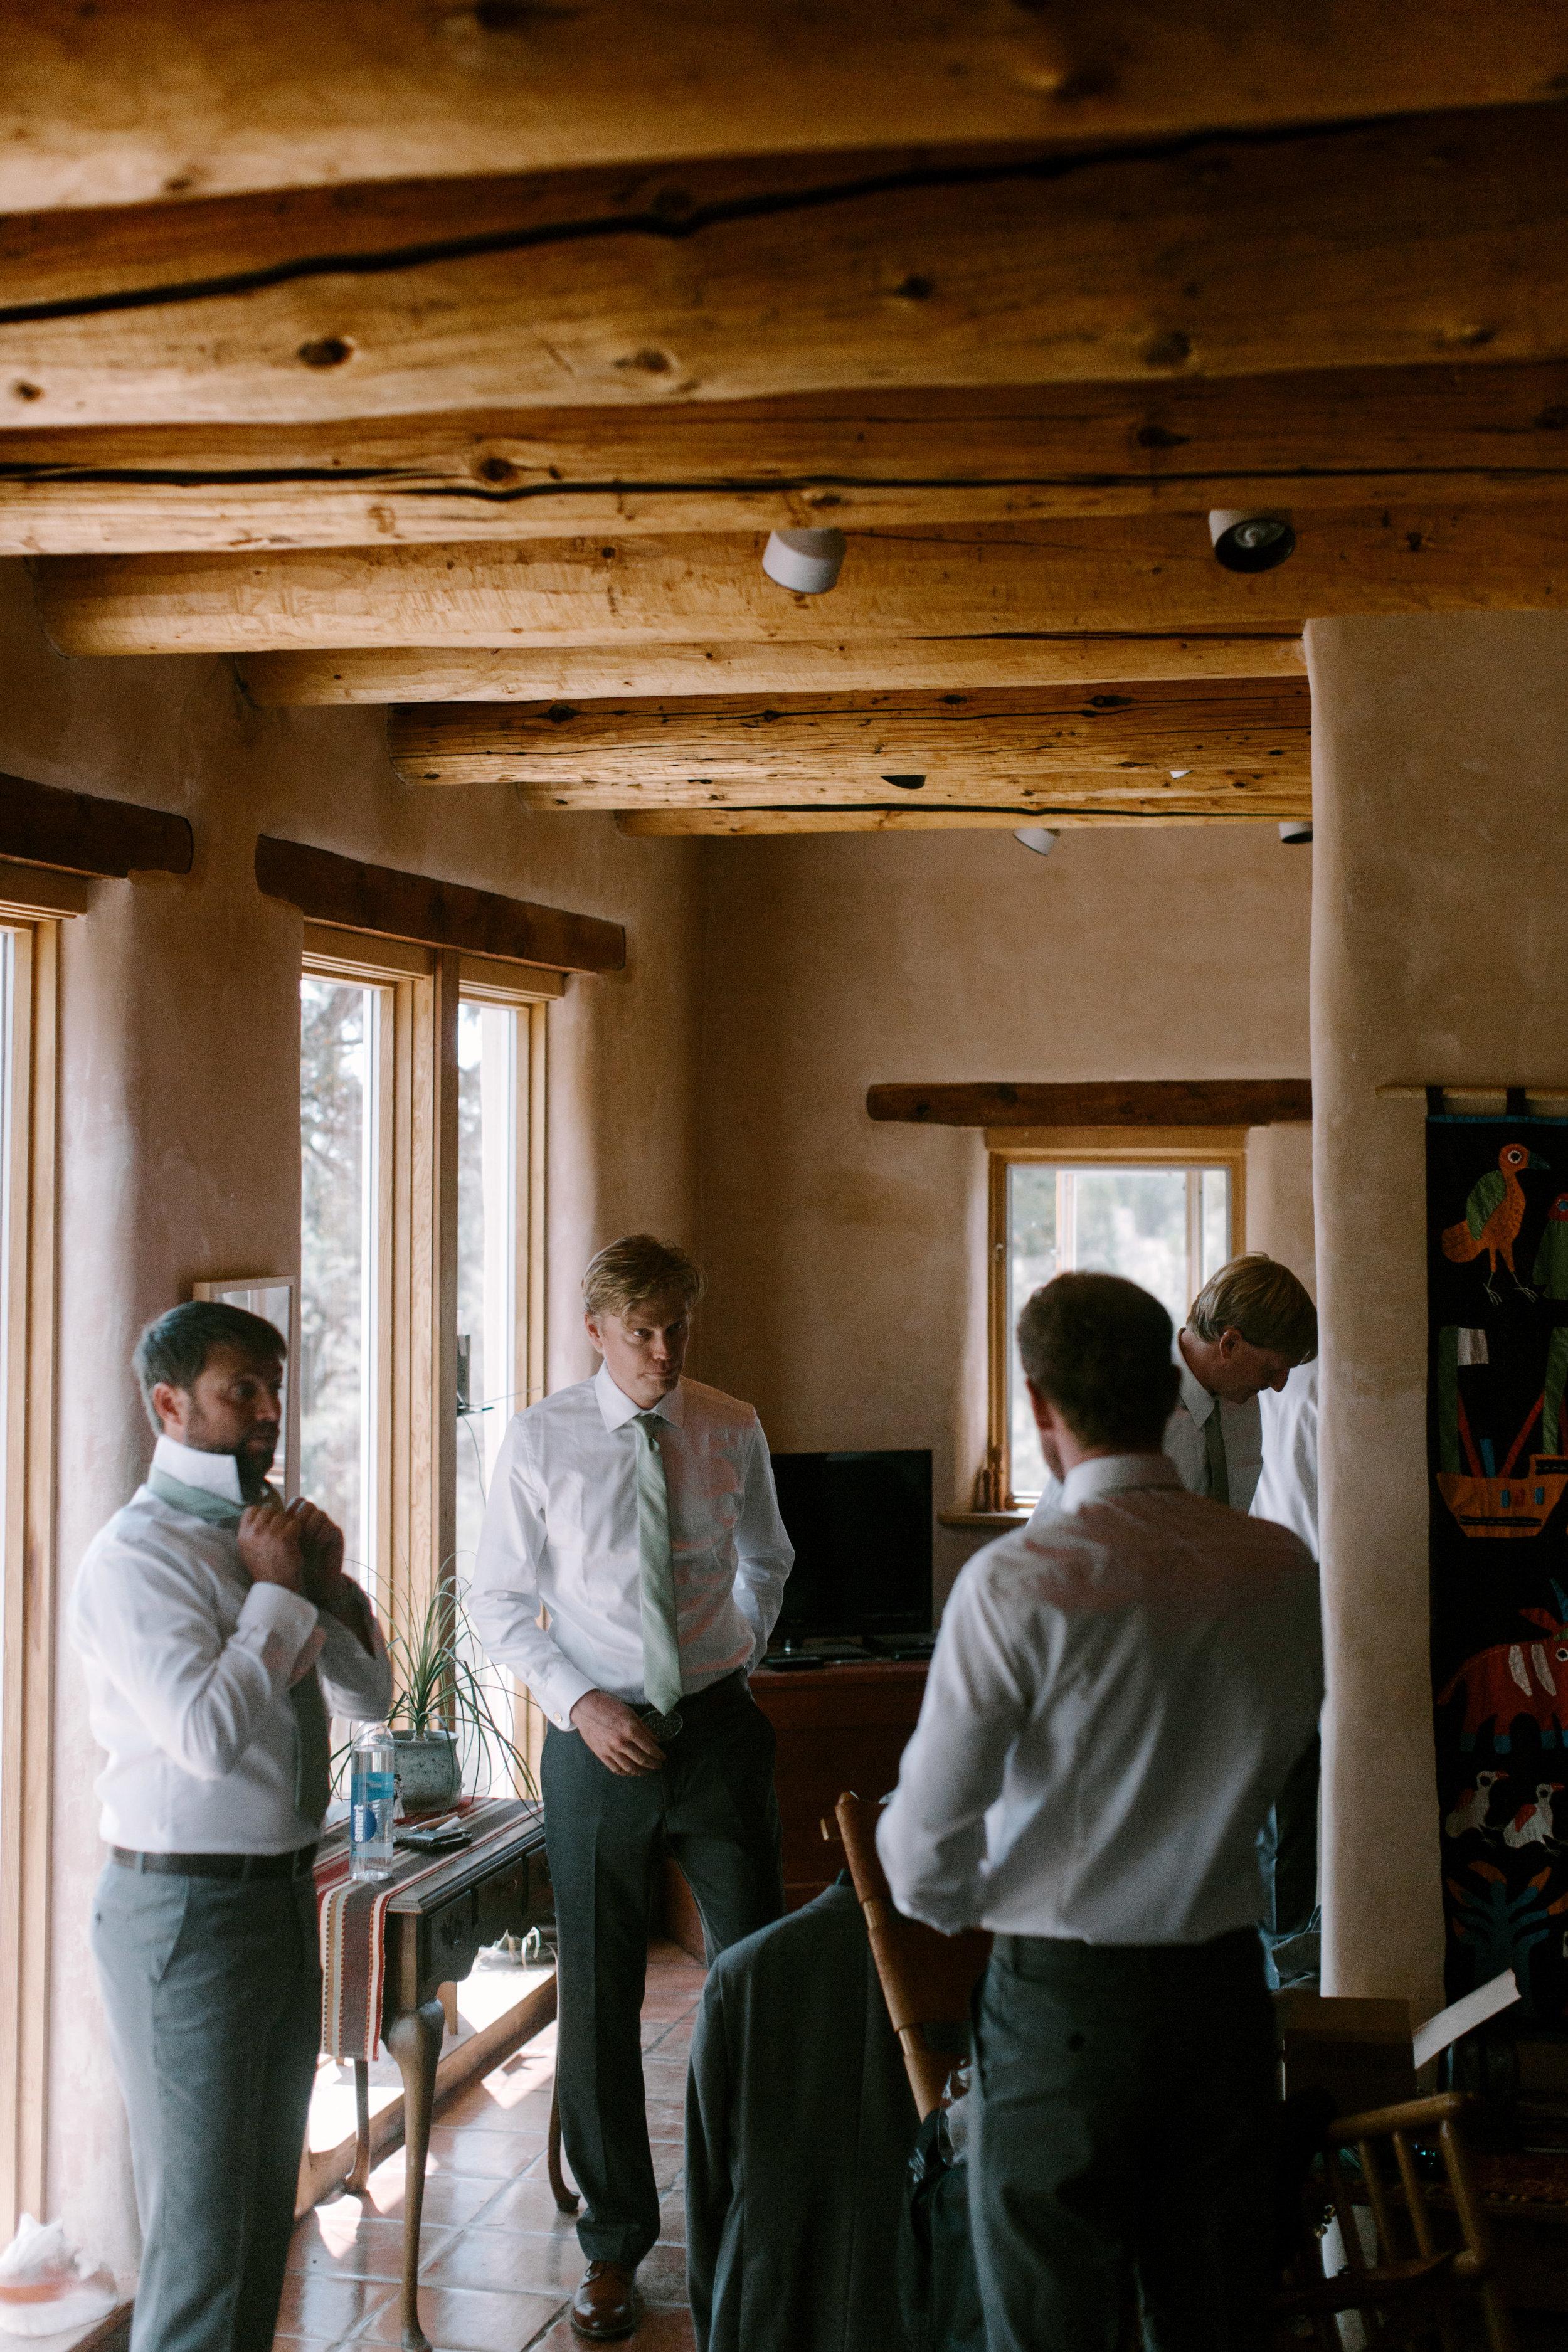 Redden, Redden Photography, Denver Wedding Photographer, Colorado Wedding Photographer, Taos Wedding Photographer, New Mexico Wedding Photographer, Fine Art Wedding Photographer, High End Wedding Photographer, Denver Photographer, New Mexico Wedding, Taos Wedding, Mountain Wedding Photographer, Adventure Wedding Photographer,